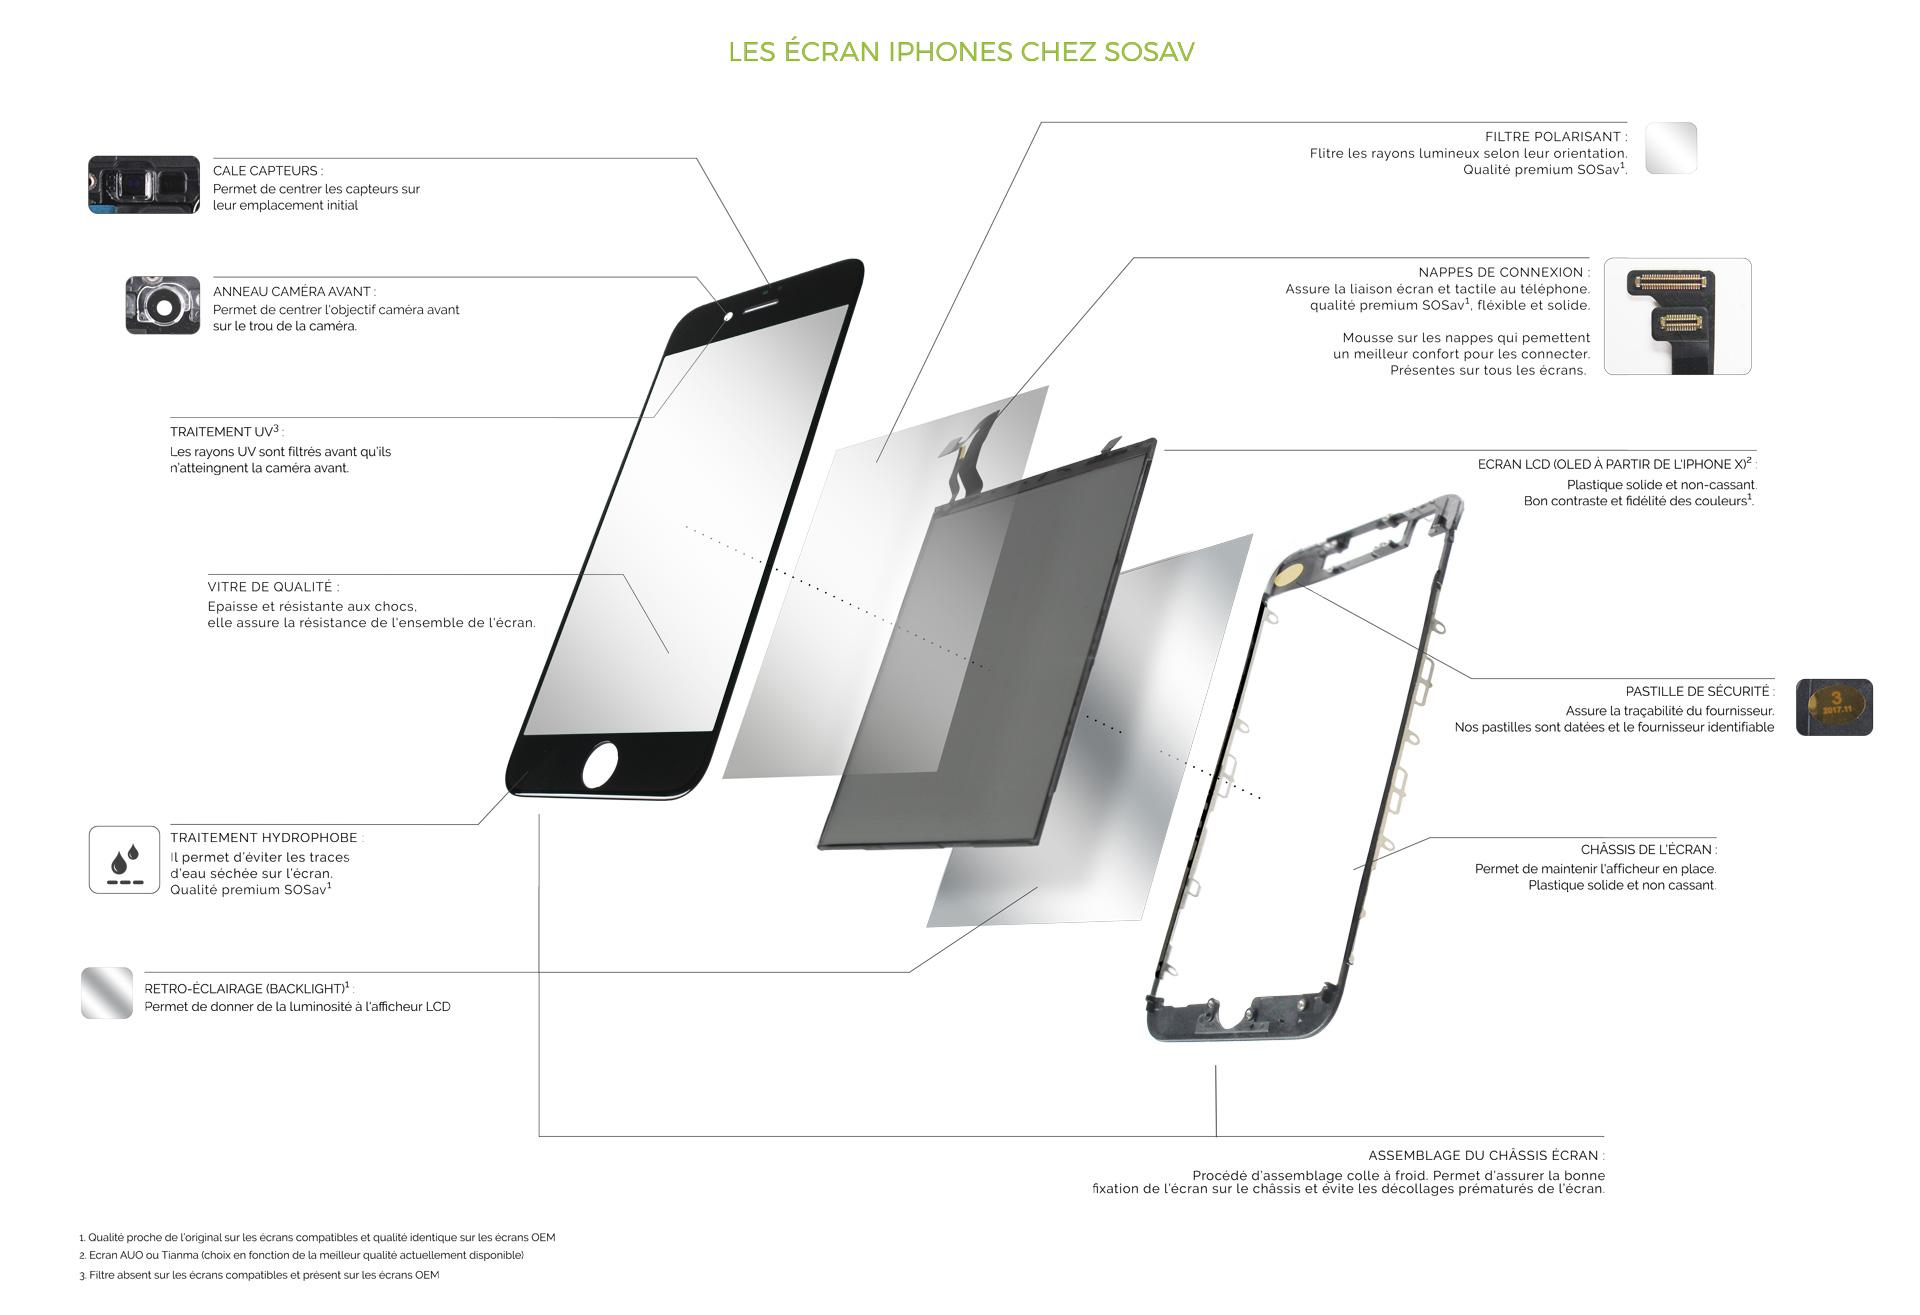 Ecran iPhone chez SOSav